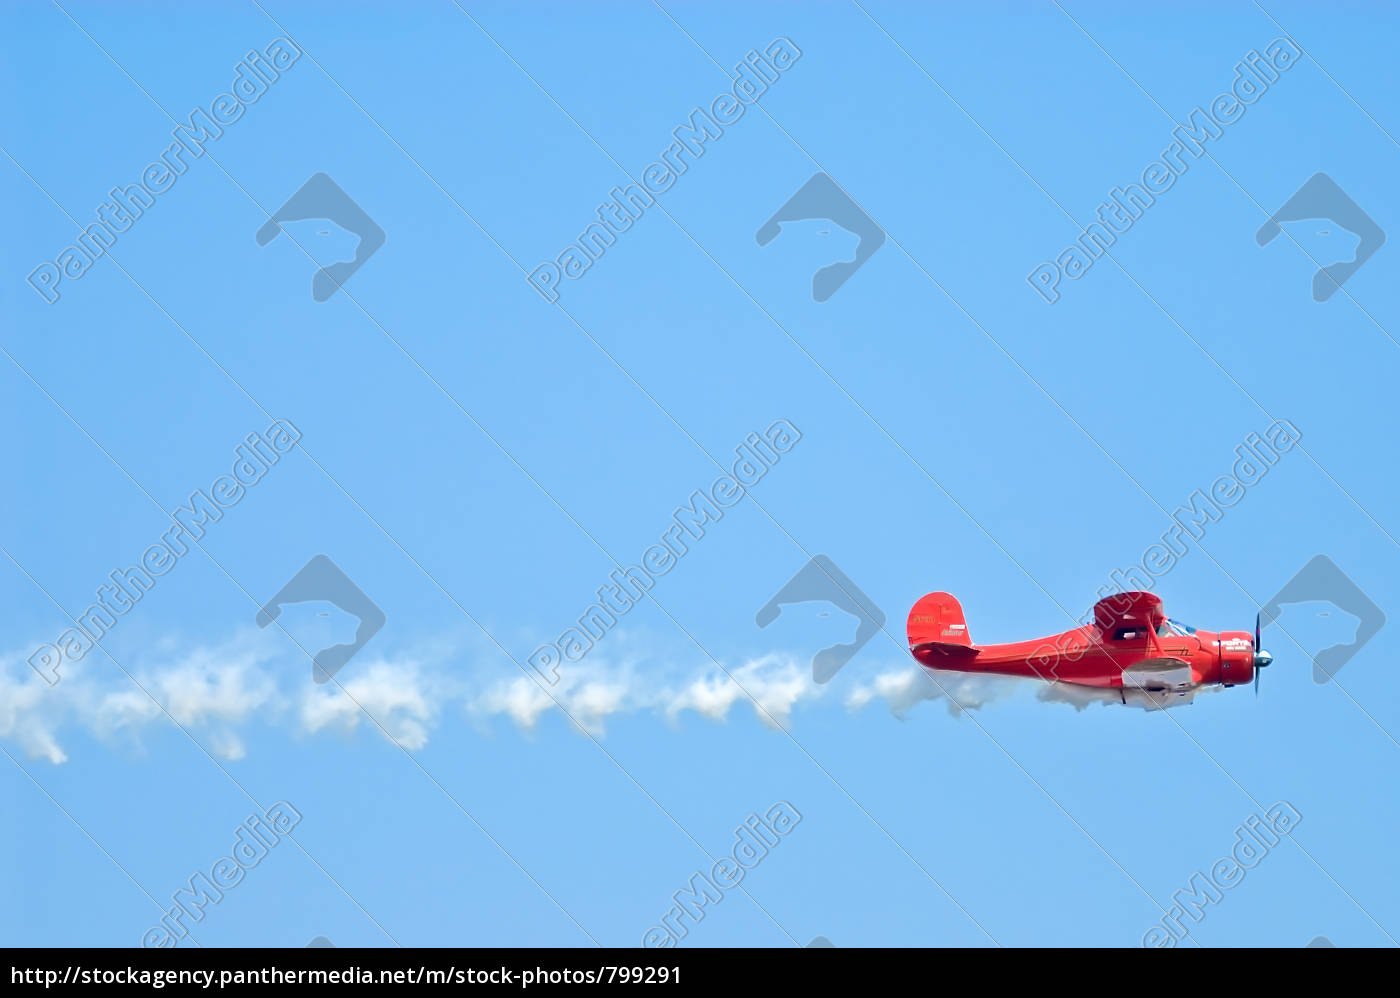 cloud, maker - 799291